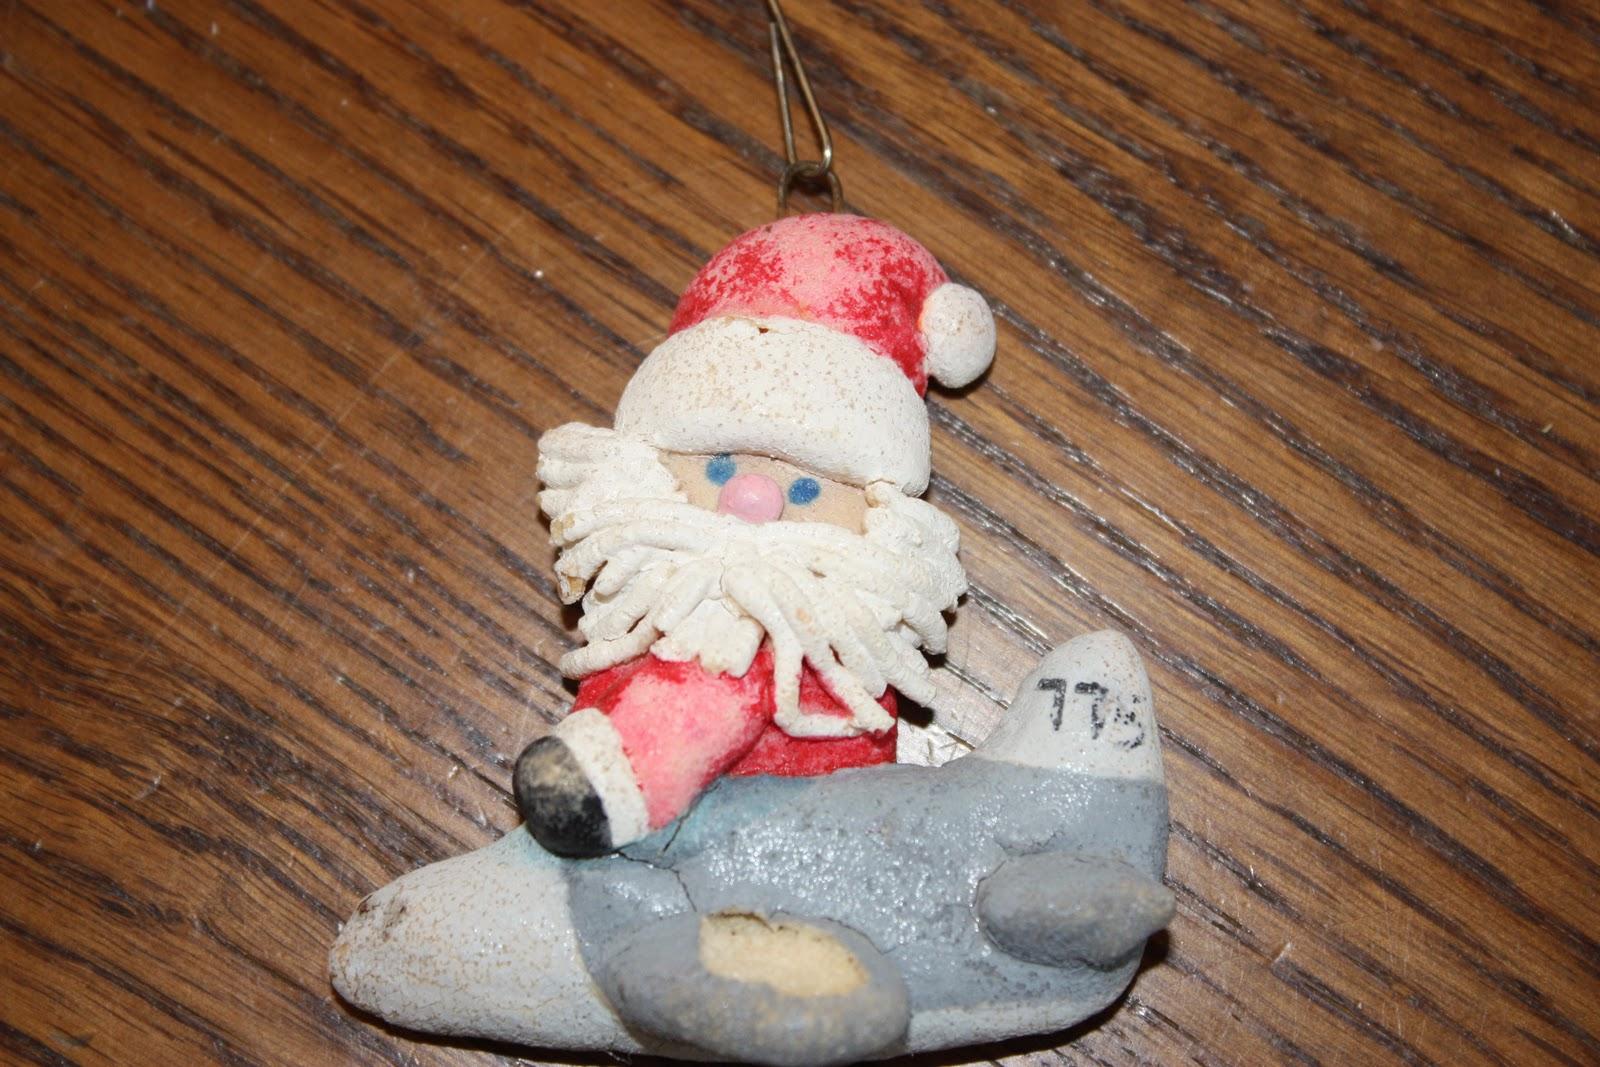 I Had An Air Bubble That Broke Off Part Of Santa's F16